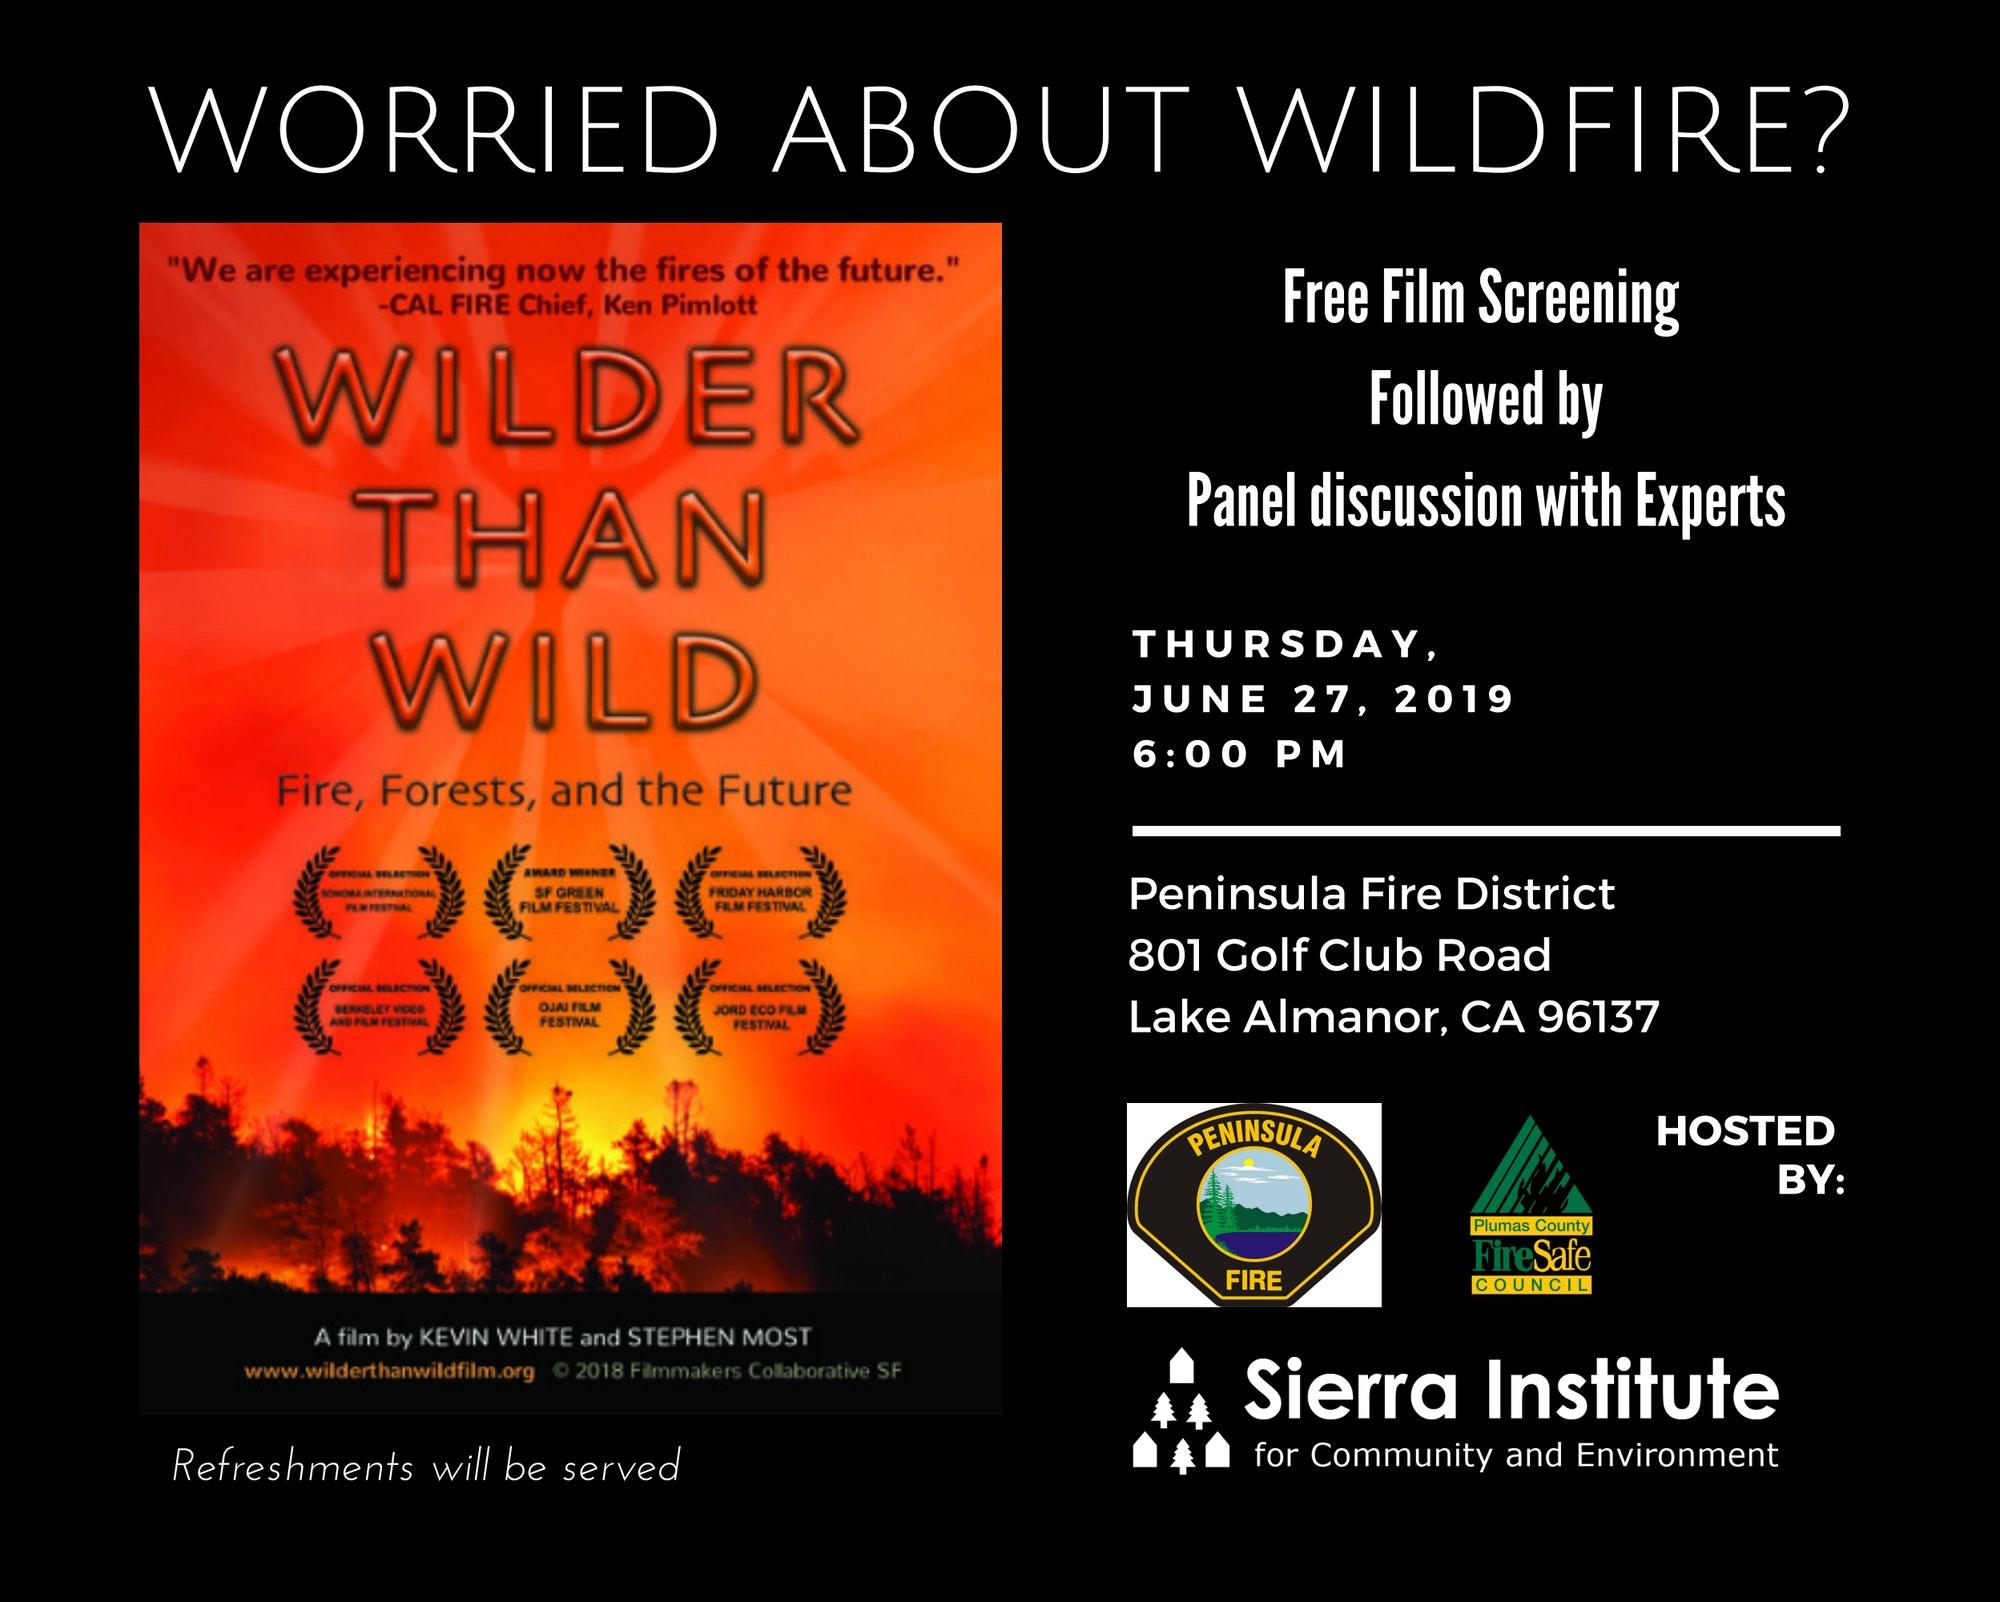 Movie Wilder than Wild shown at Peninsula Fire District June 27 Station 2